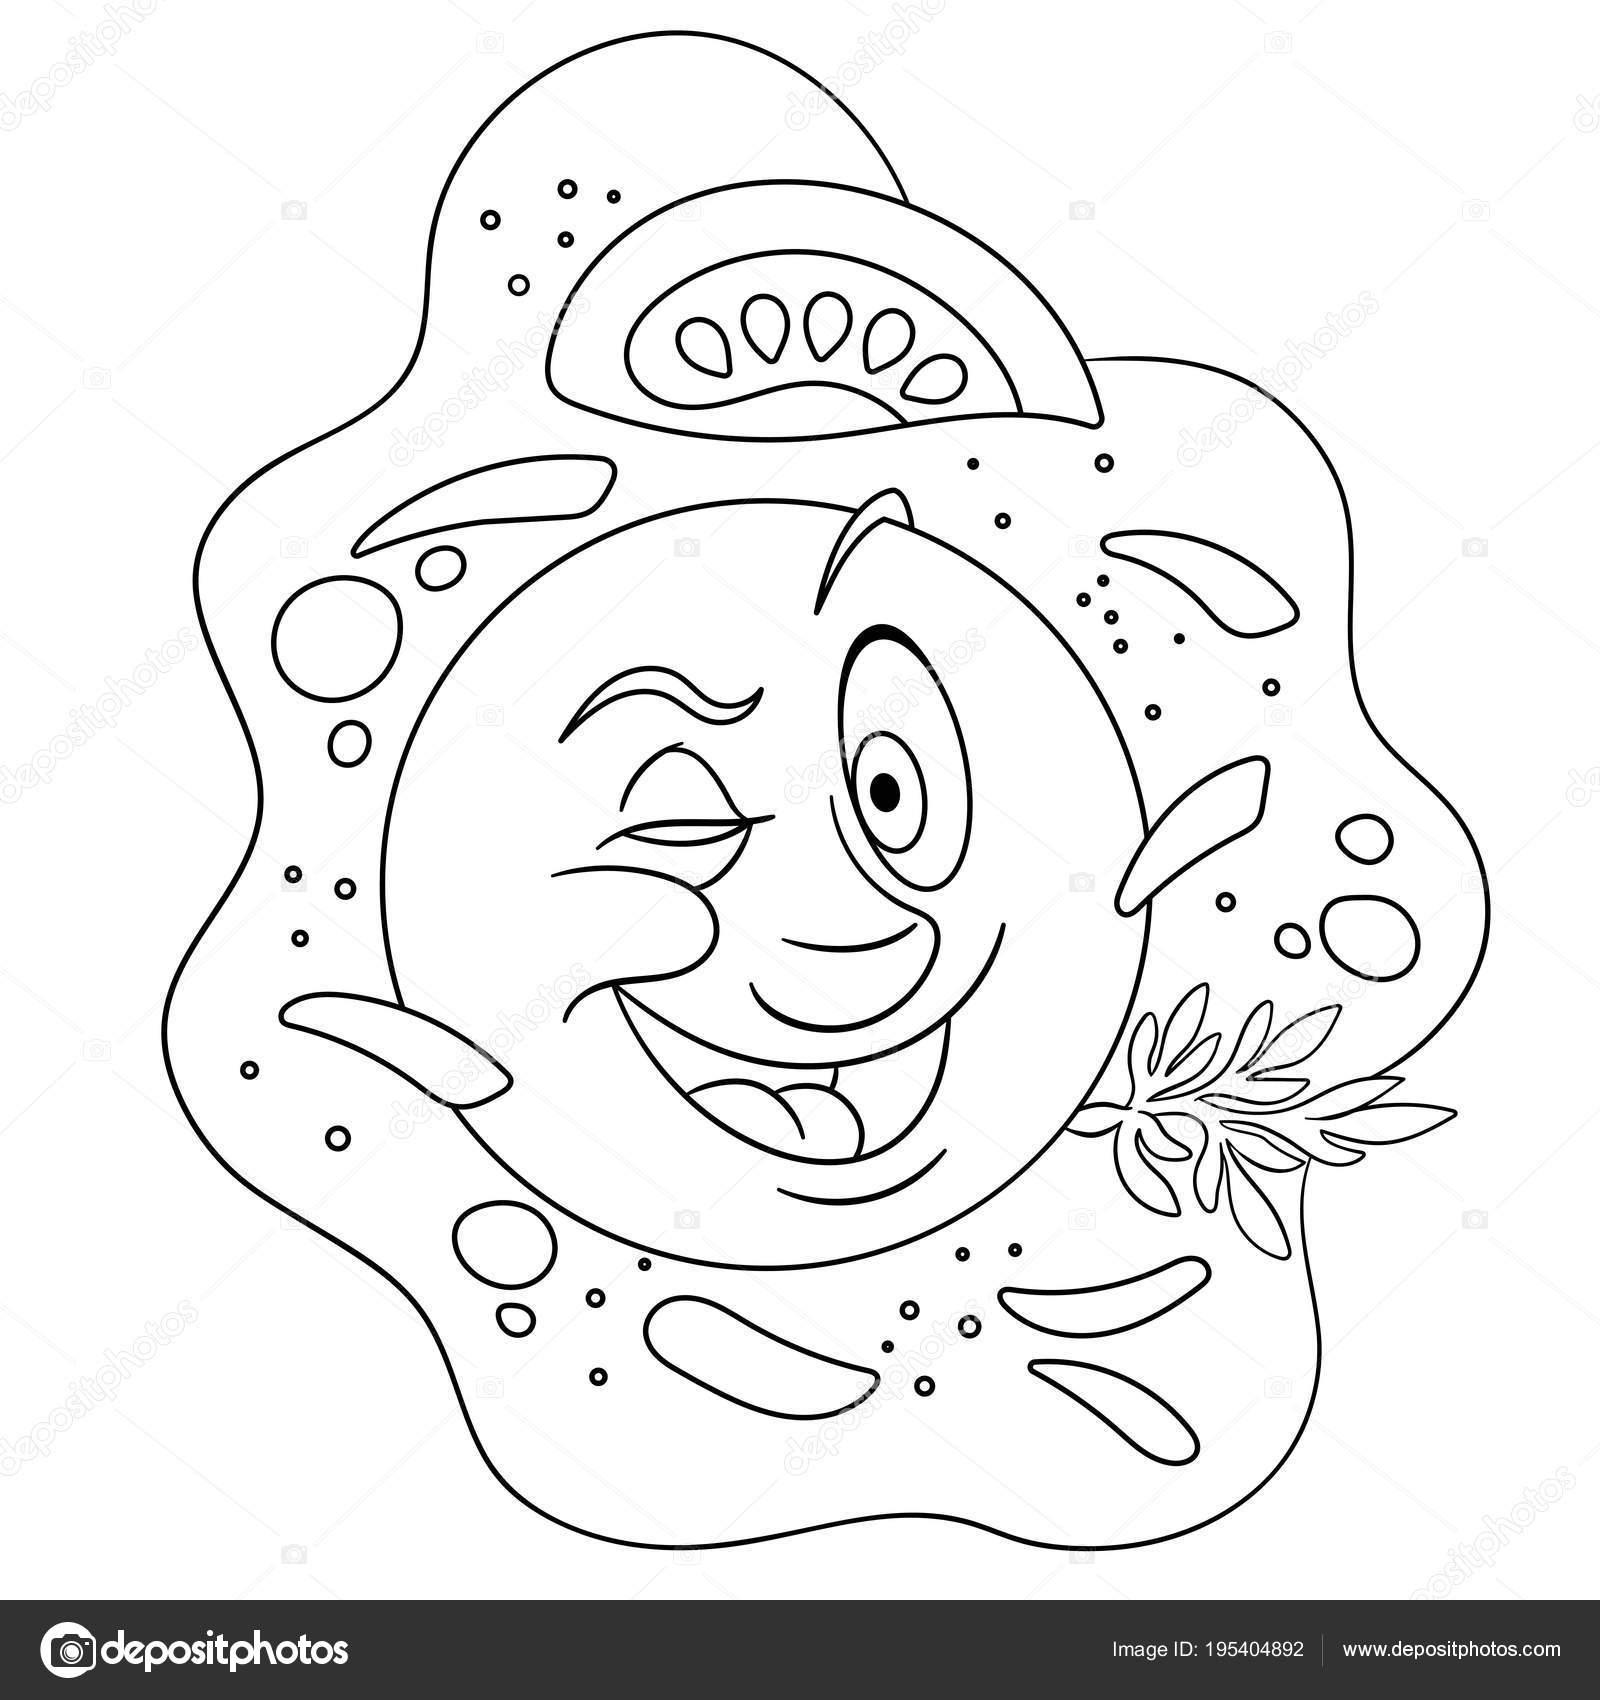 Dessin Animé Drôle Oeuf Au Plat Image Vectorielle Sybirko 195404892